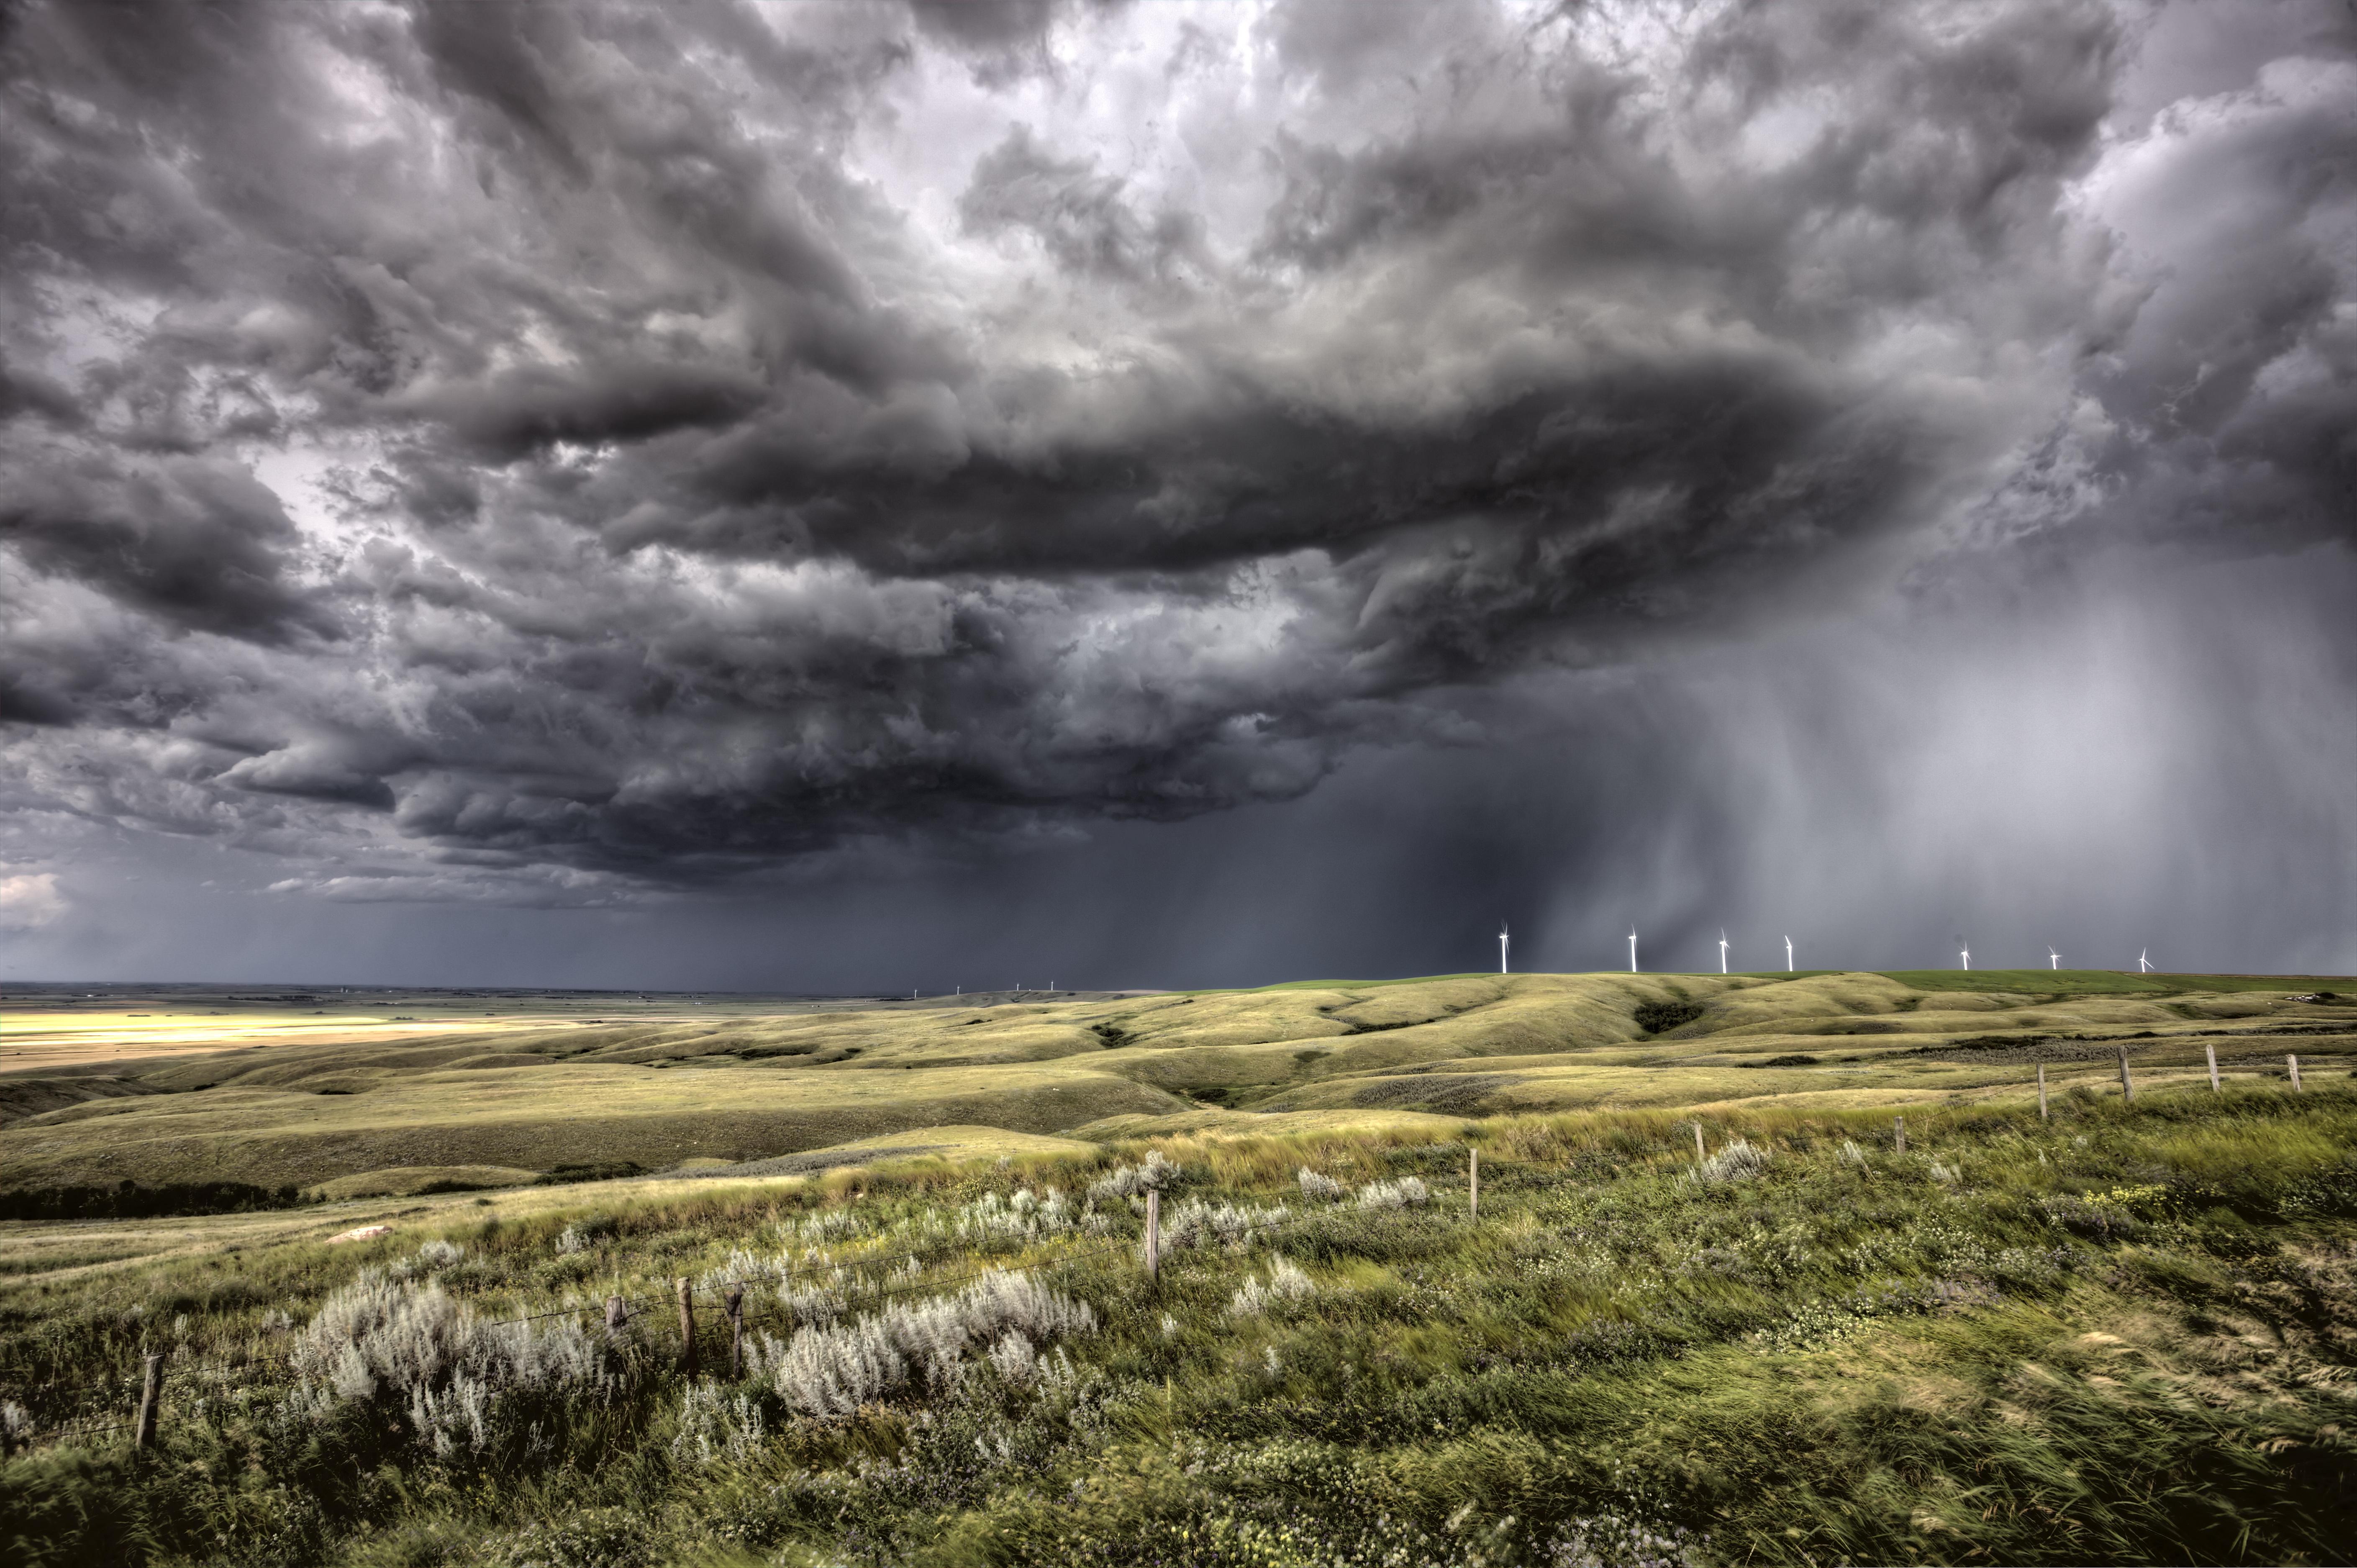 Ultra heavy clouds / 3000 x 2000 / Skyandclouds, Landscape ...